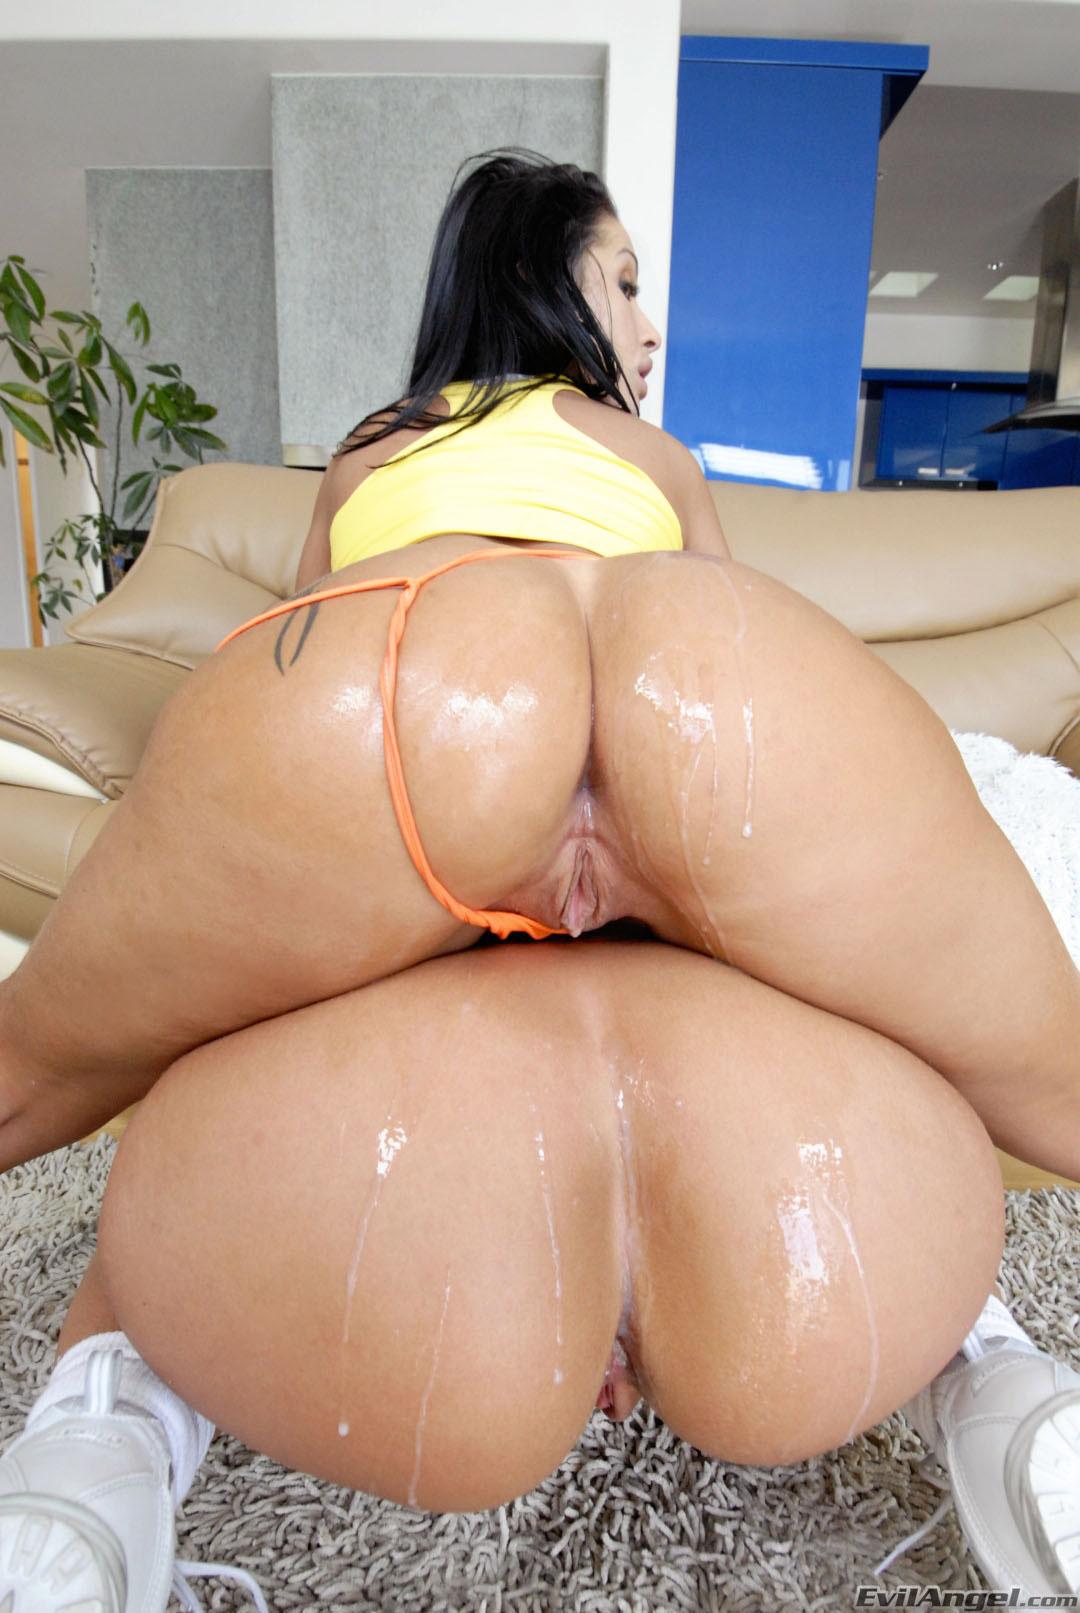 Monica santiago anal sex opinion